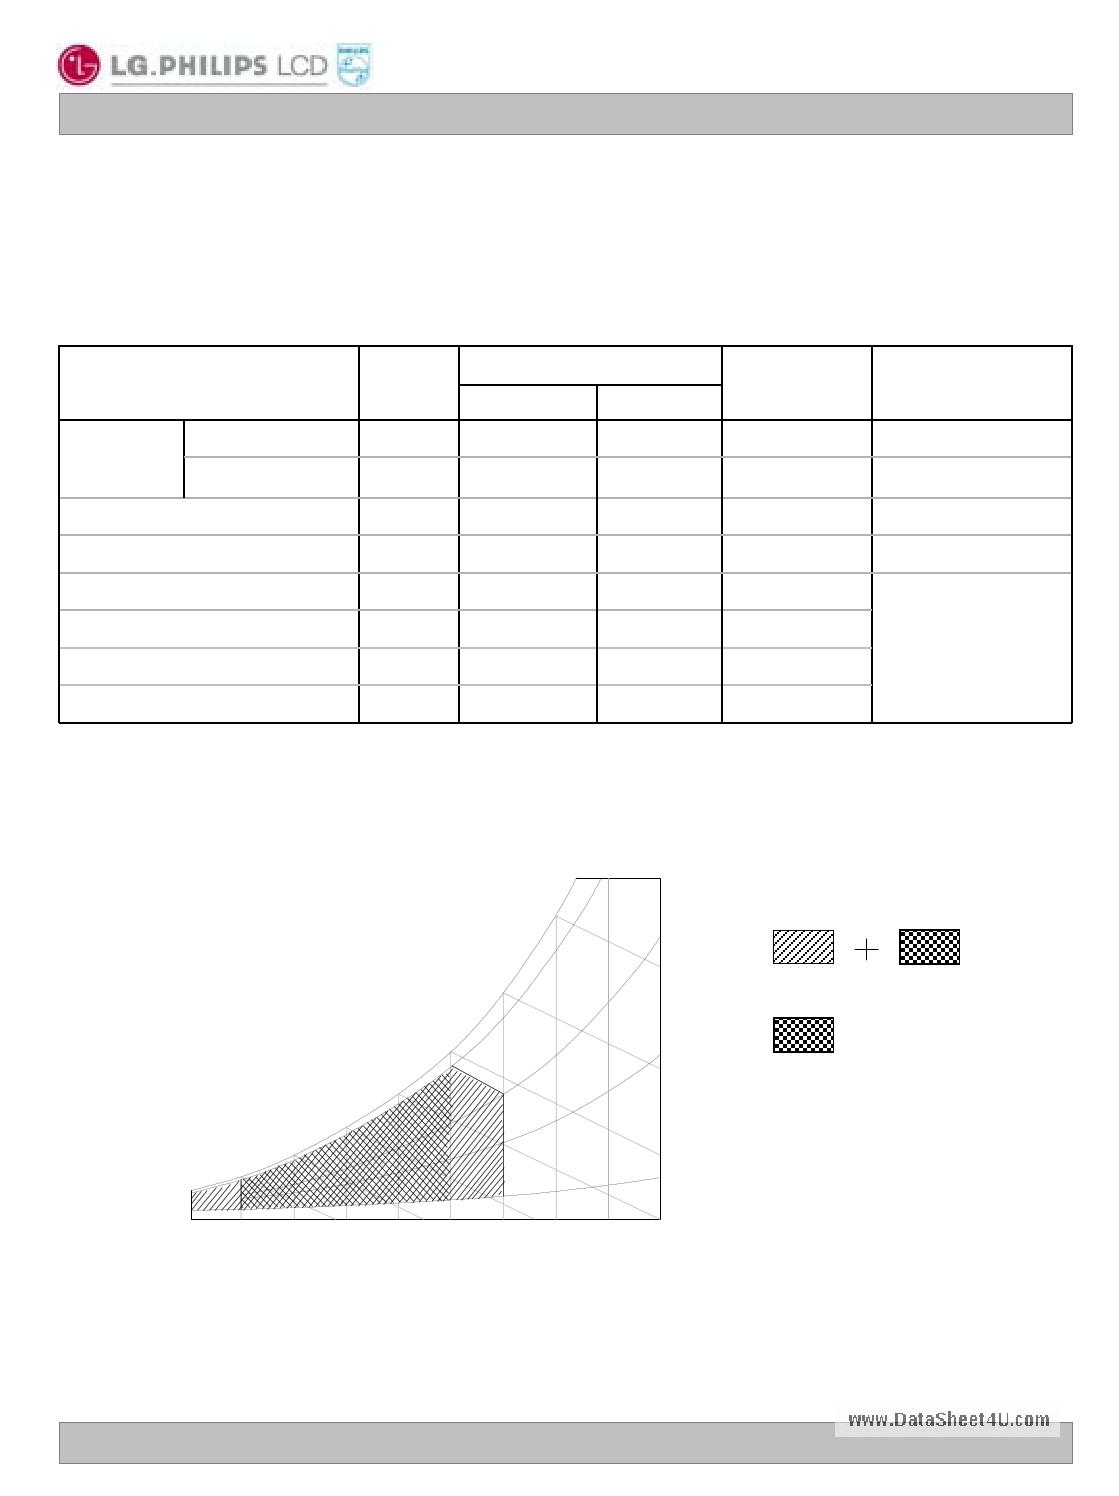 LC320W01 pdf